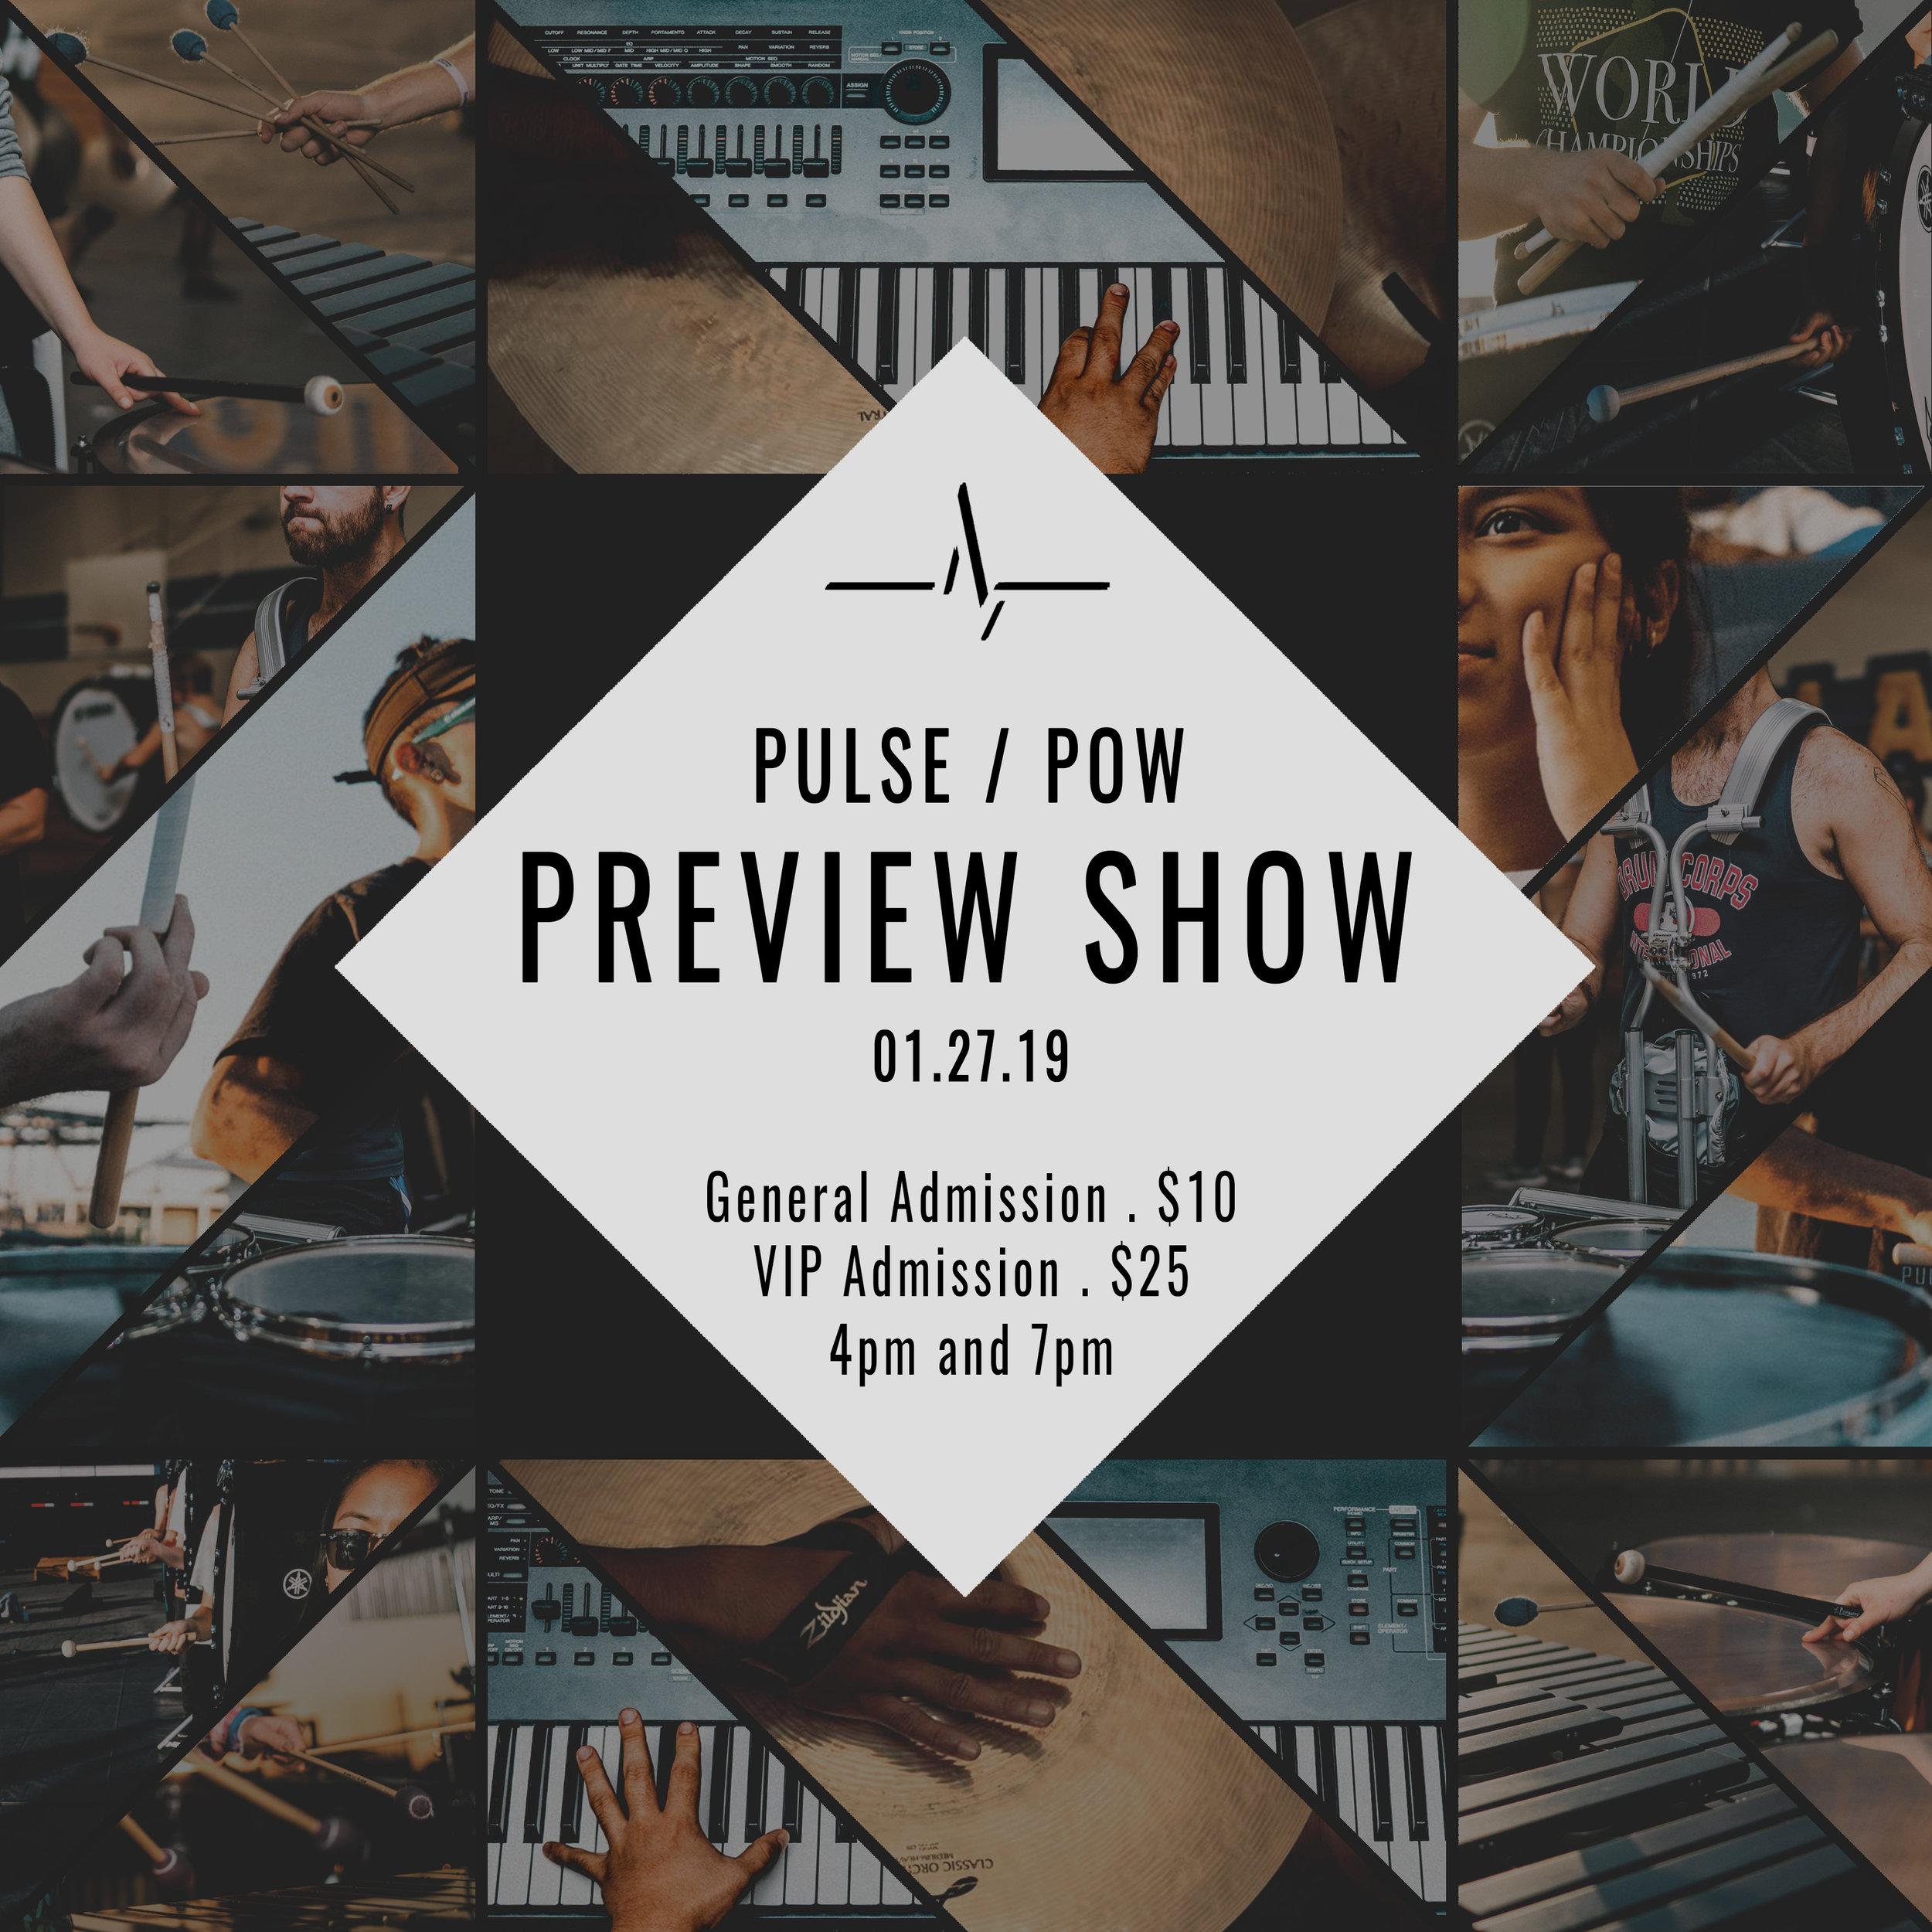 Pulse promo1.jpg